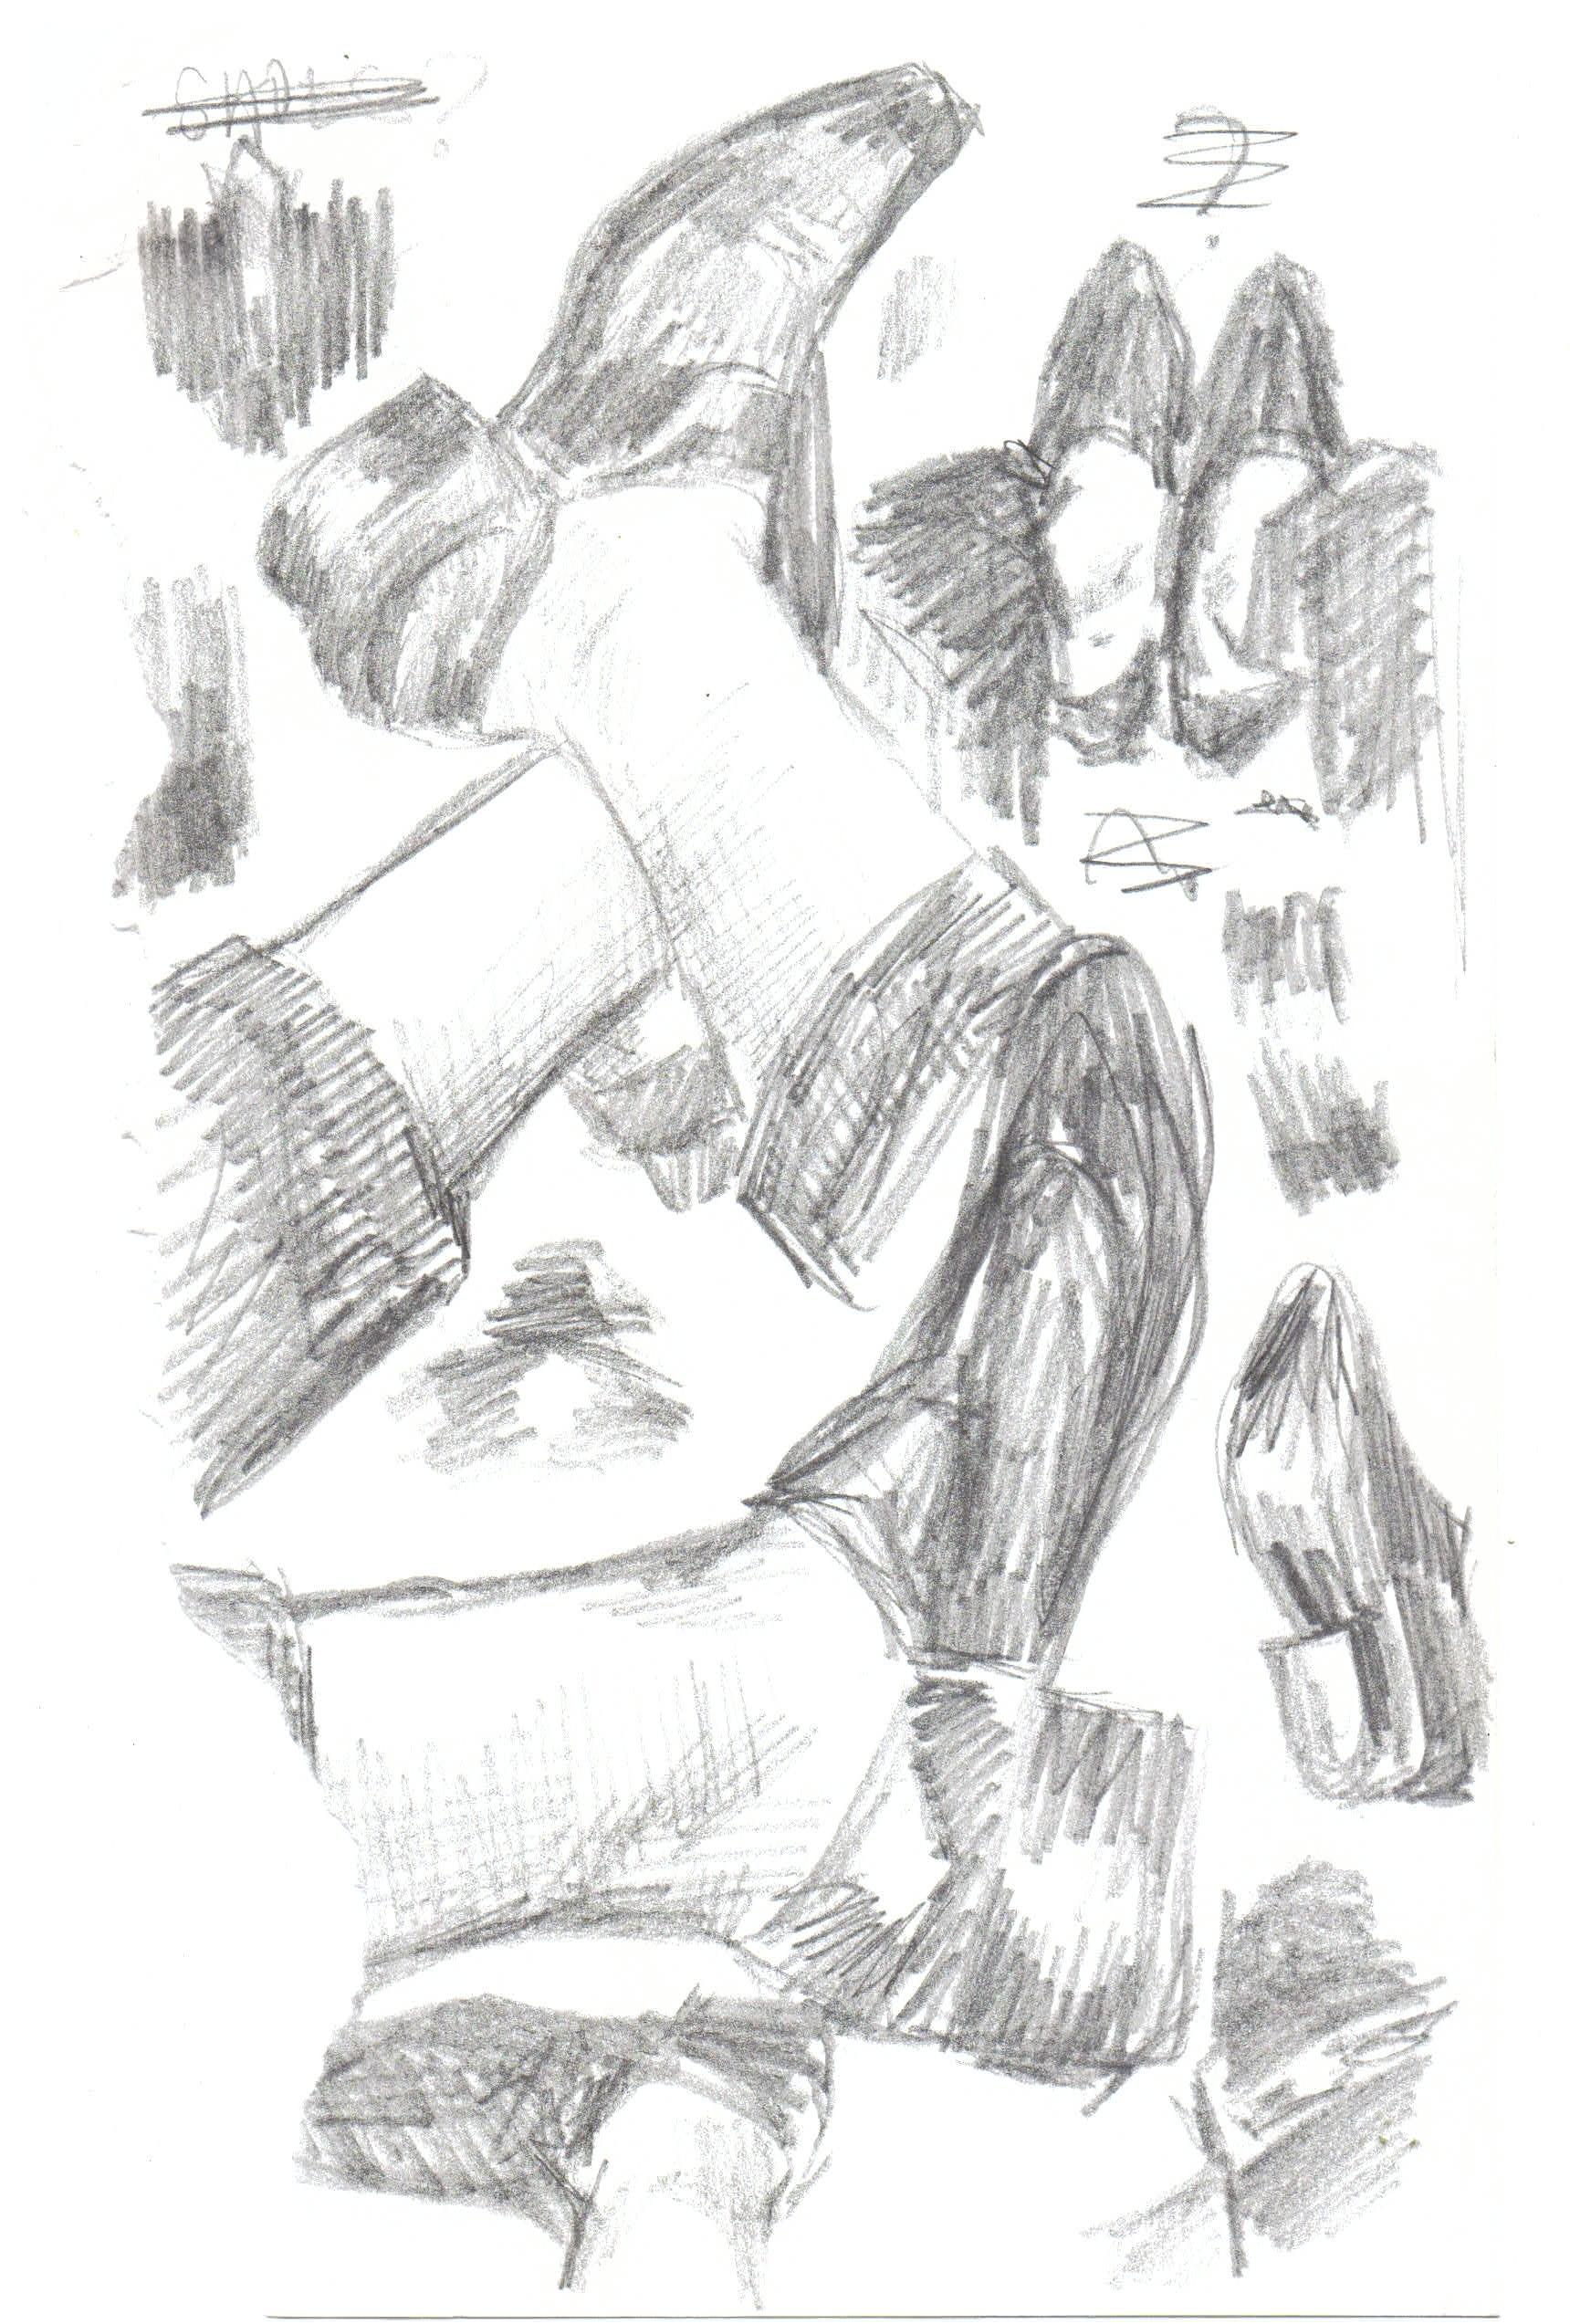 American Eagle,  2018. Pencil on Paper